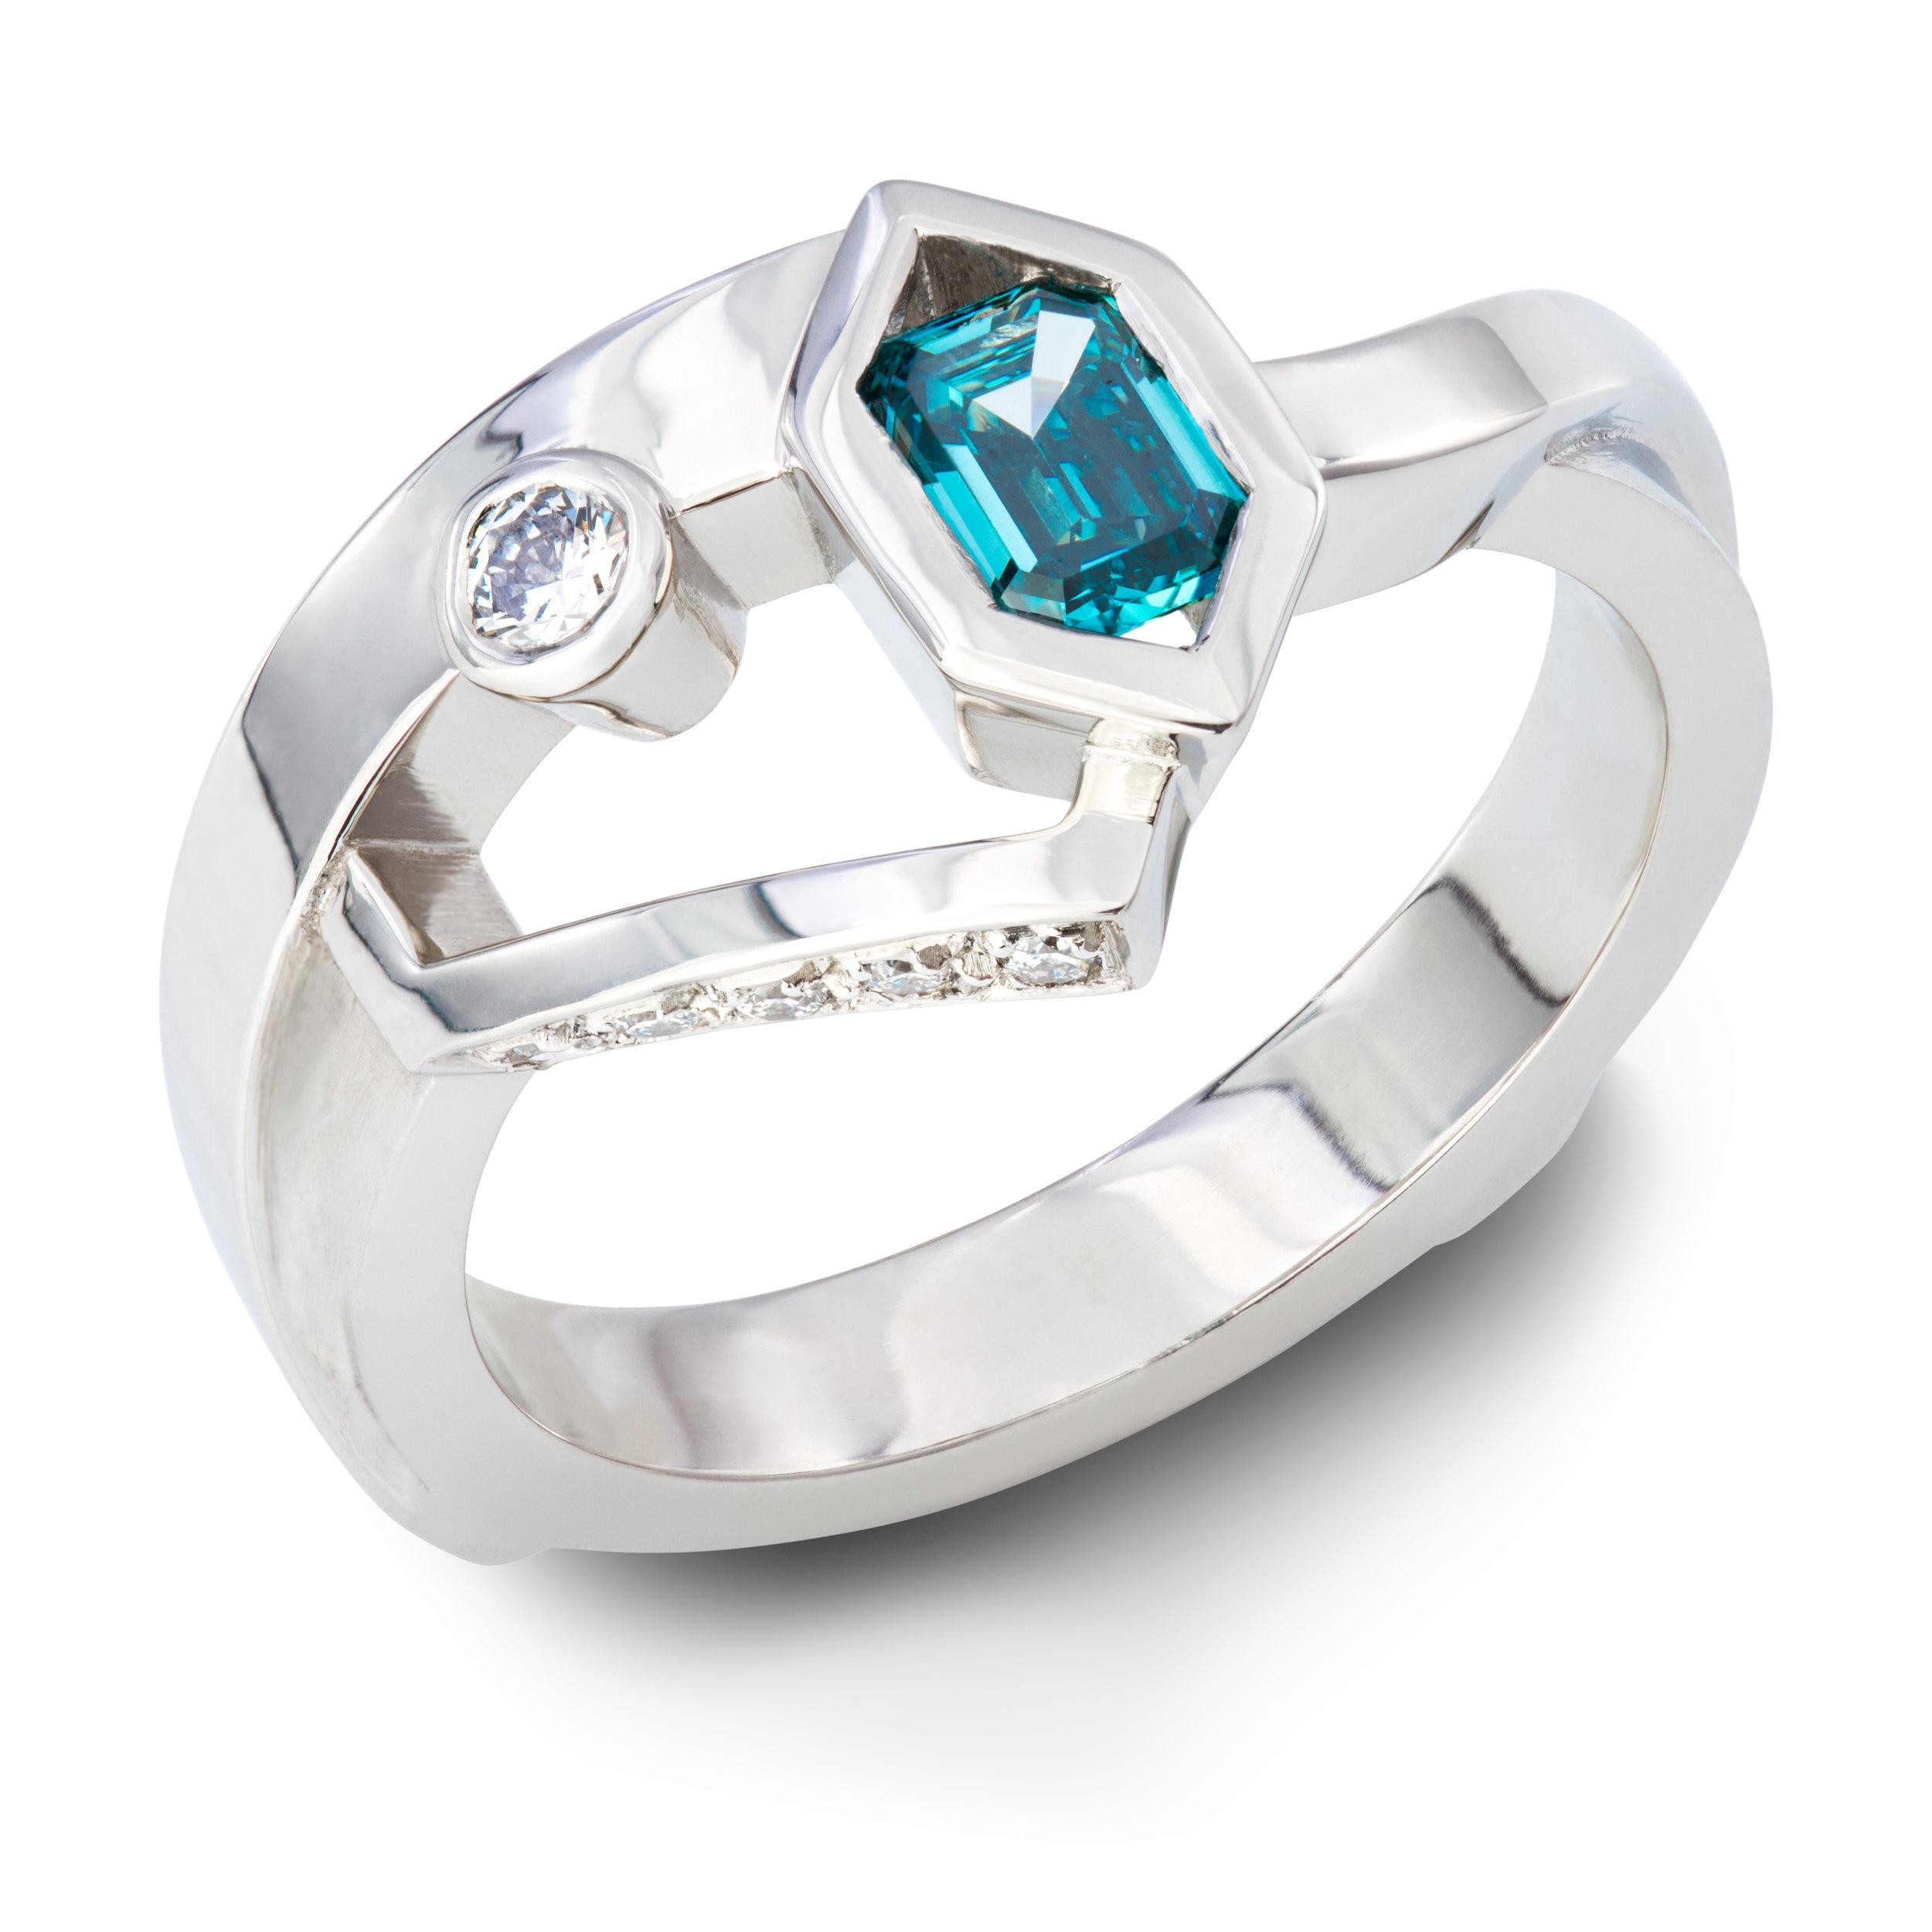 Platinum ring set with one octagonal treated blue diamond and six round brilliant cut diamonds - £3,270